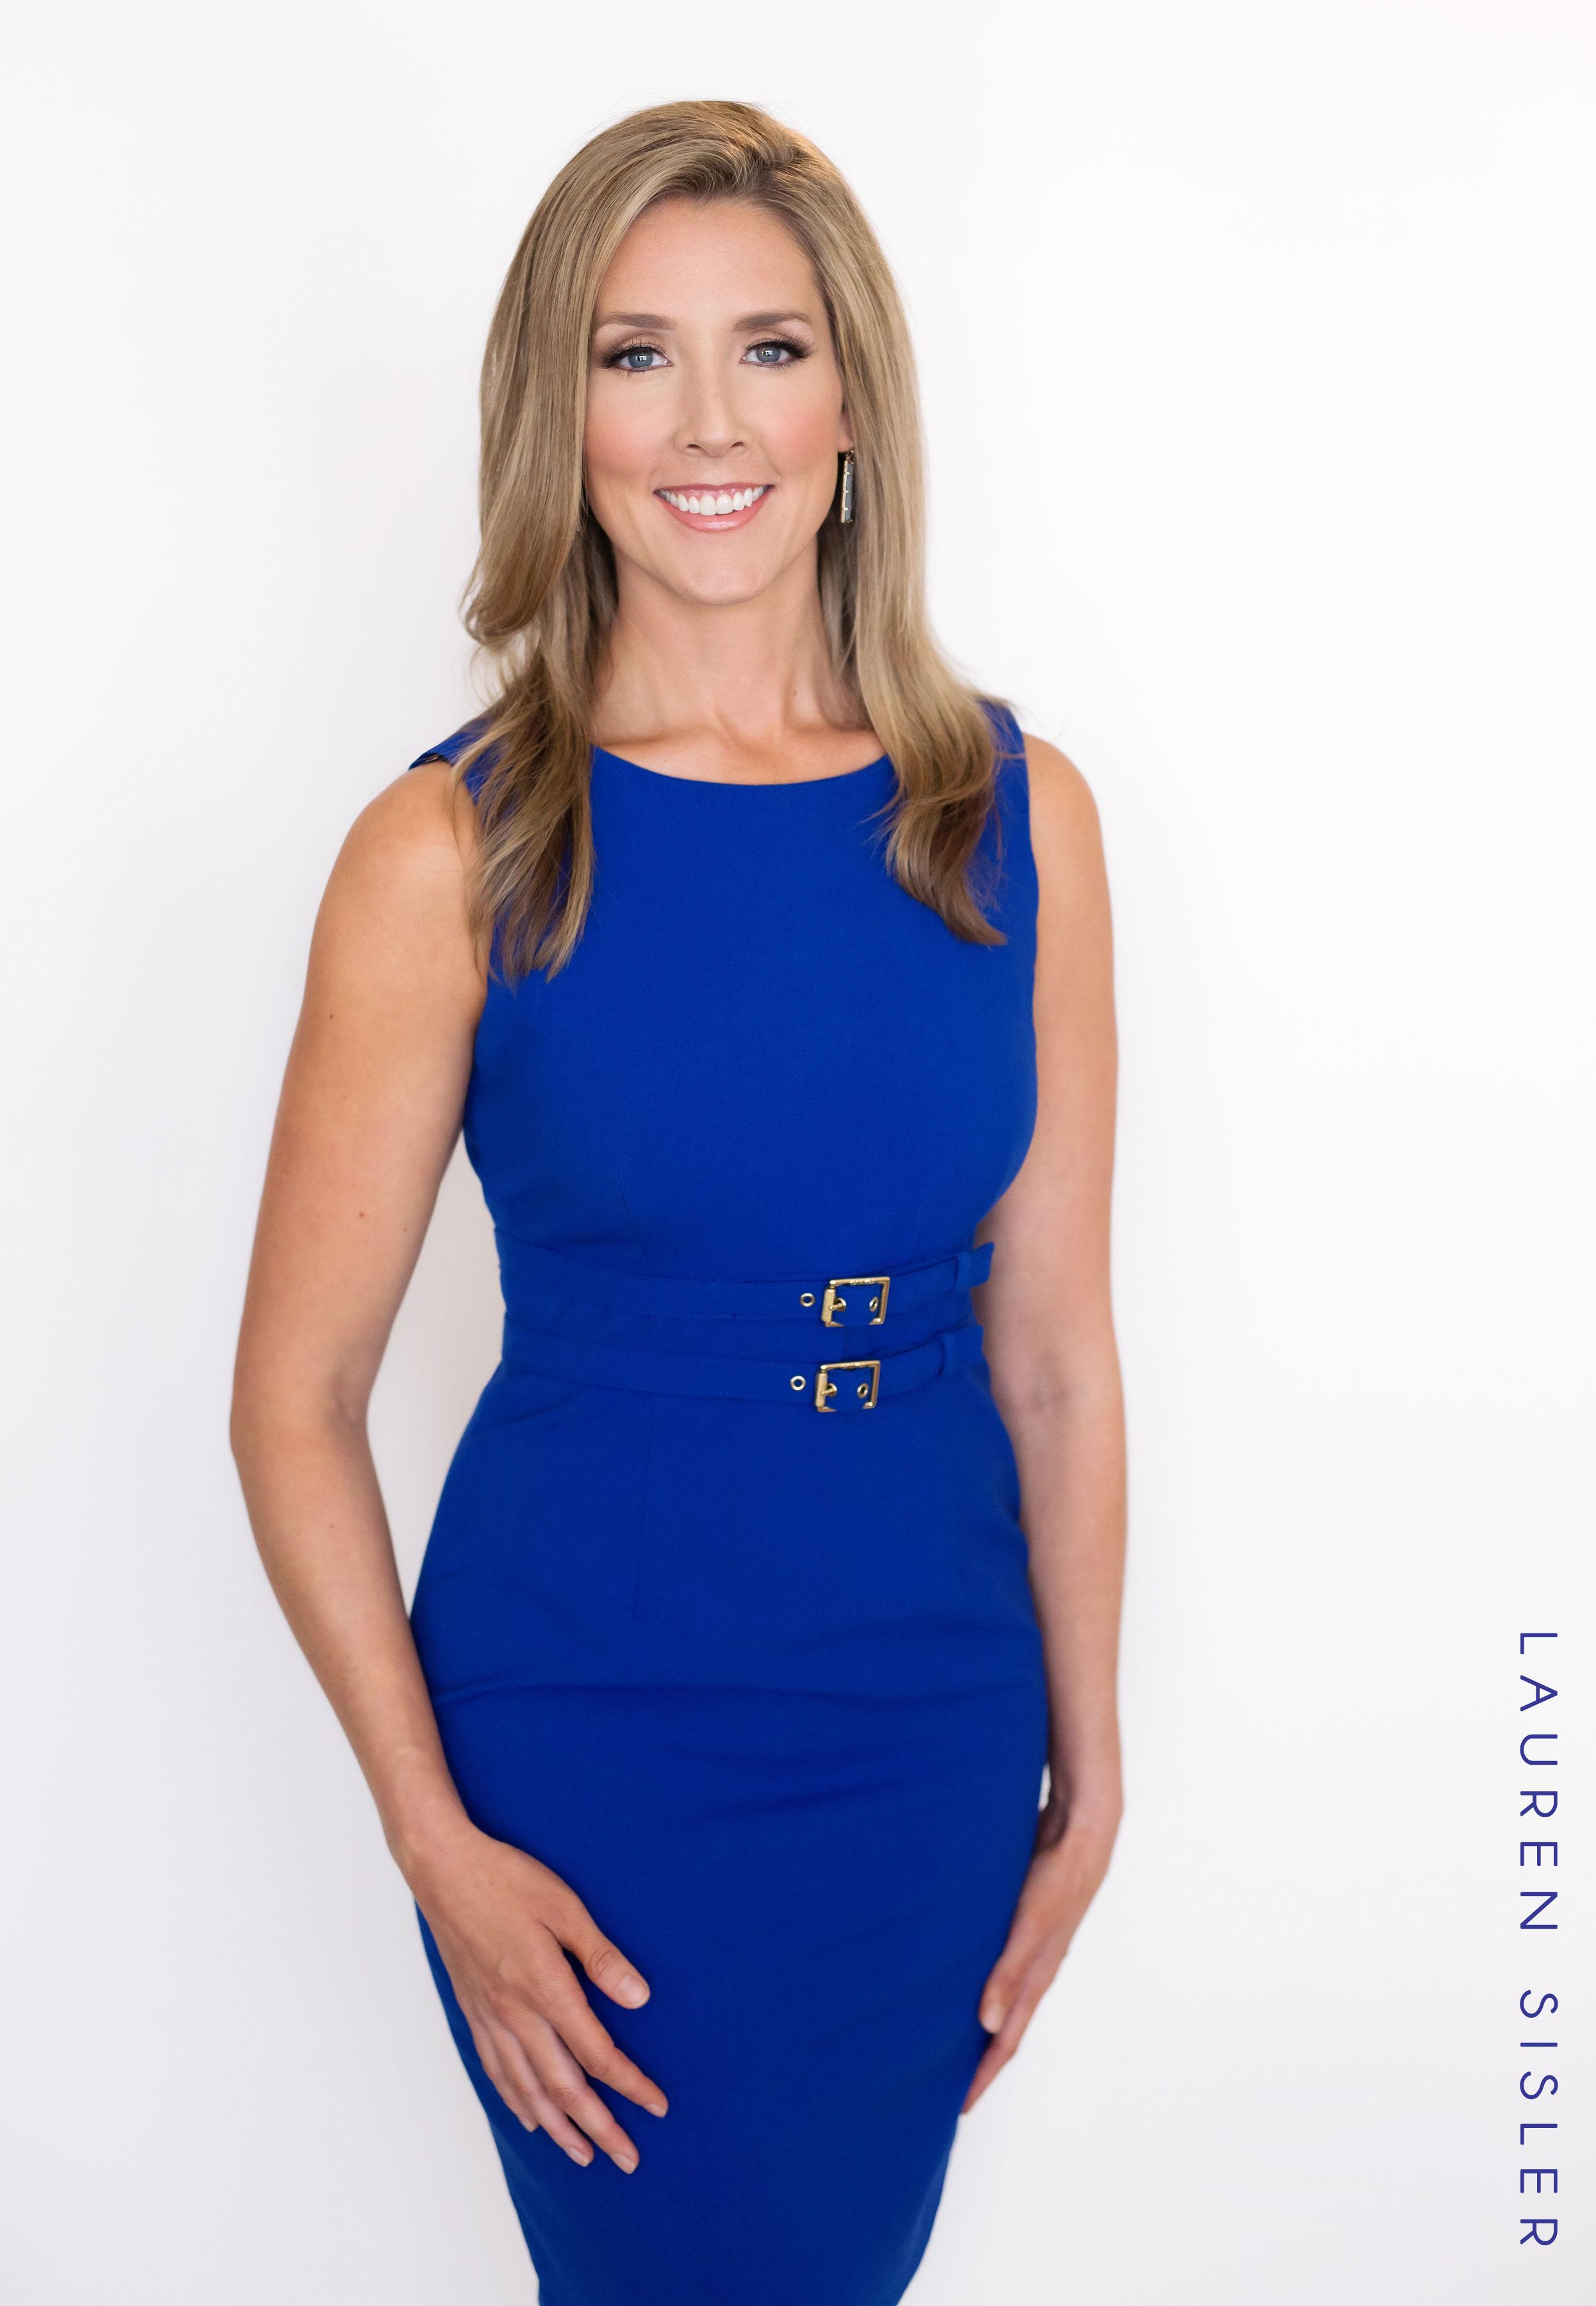 Lauren Sisler Headshot 1 hi res.jpg